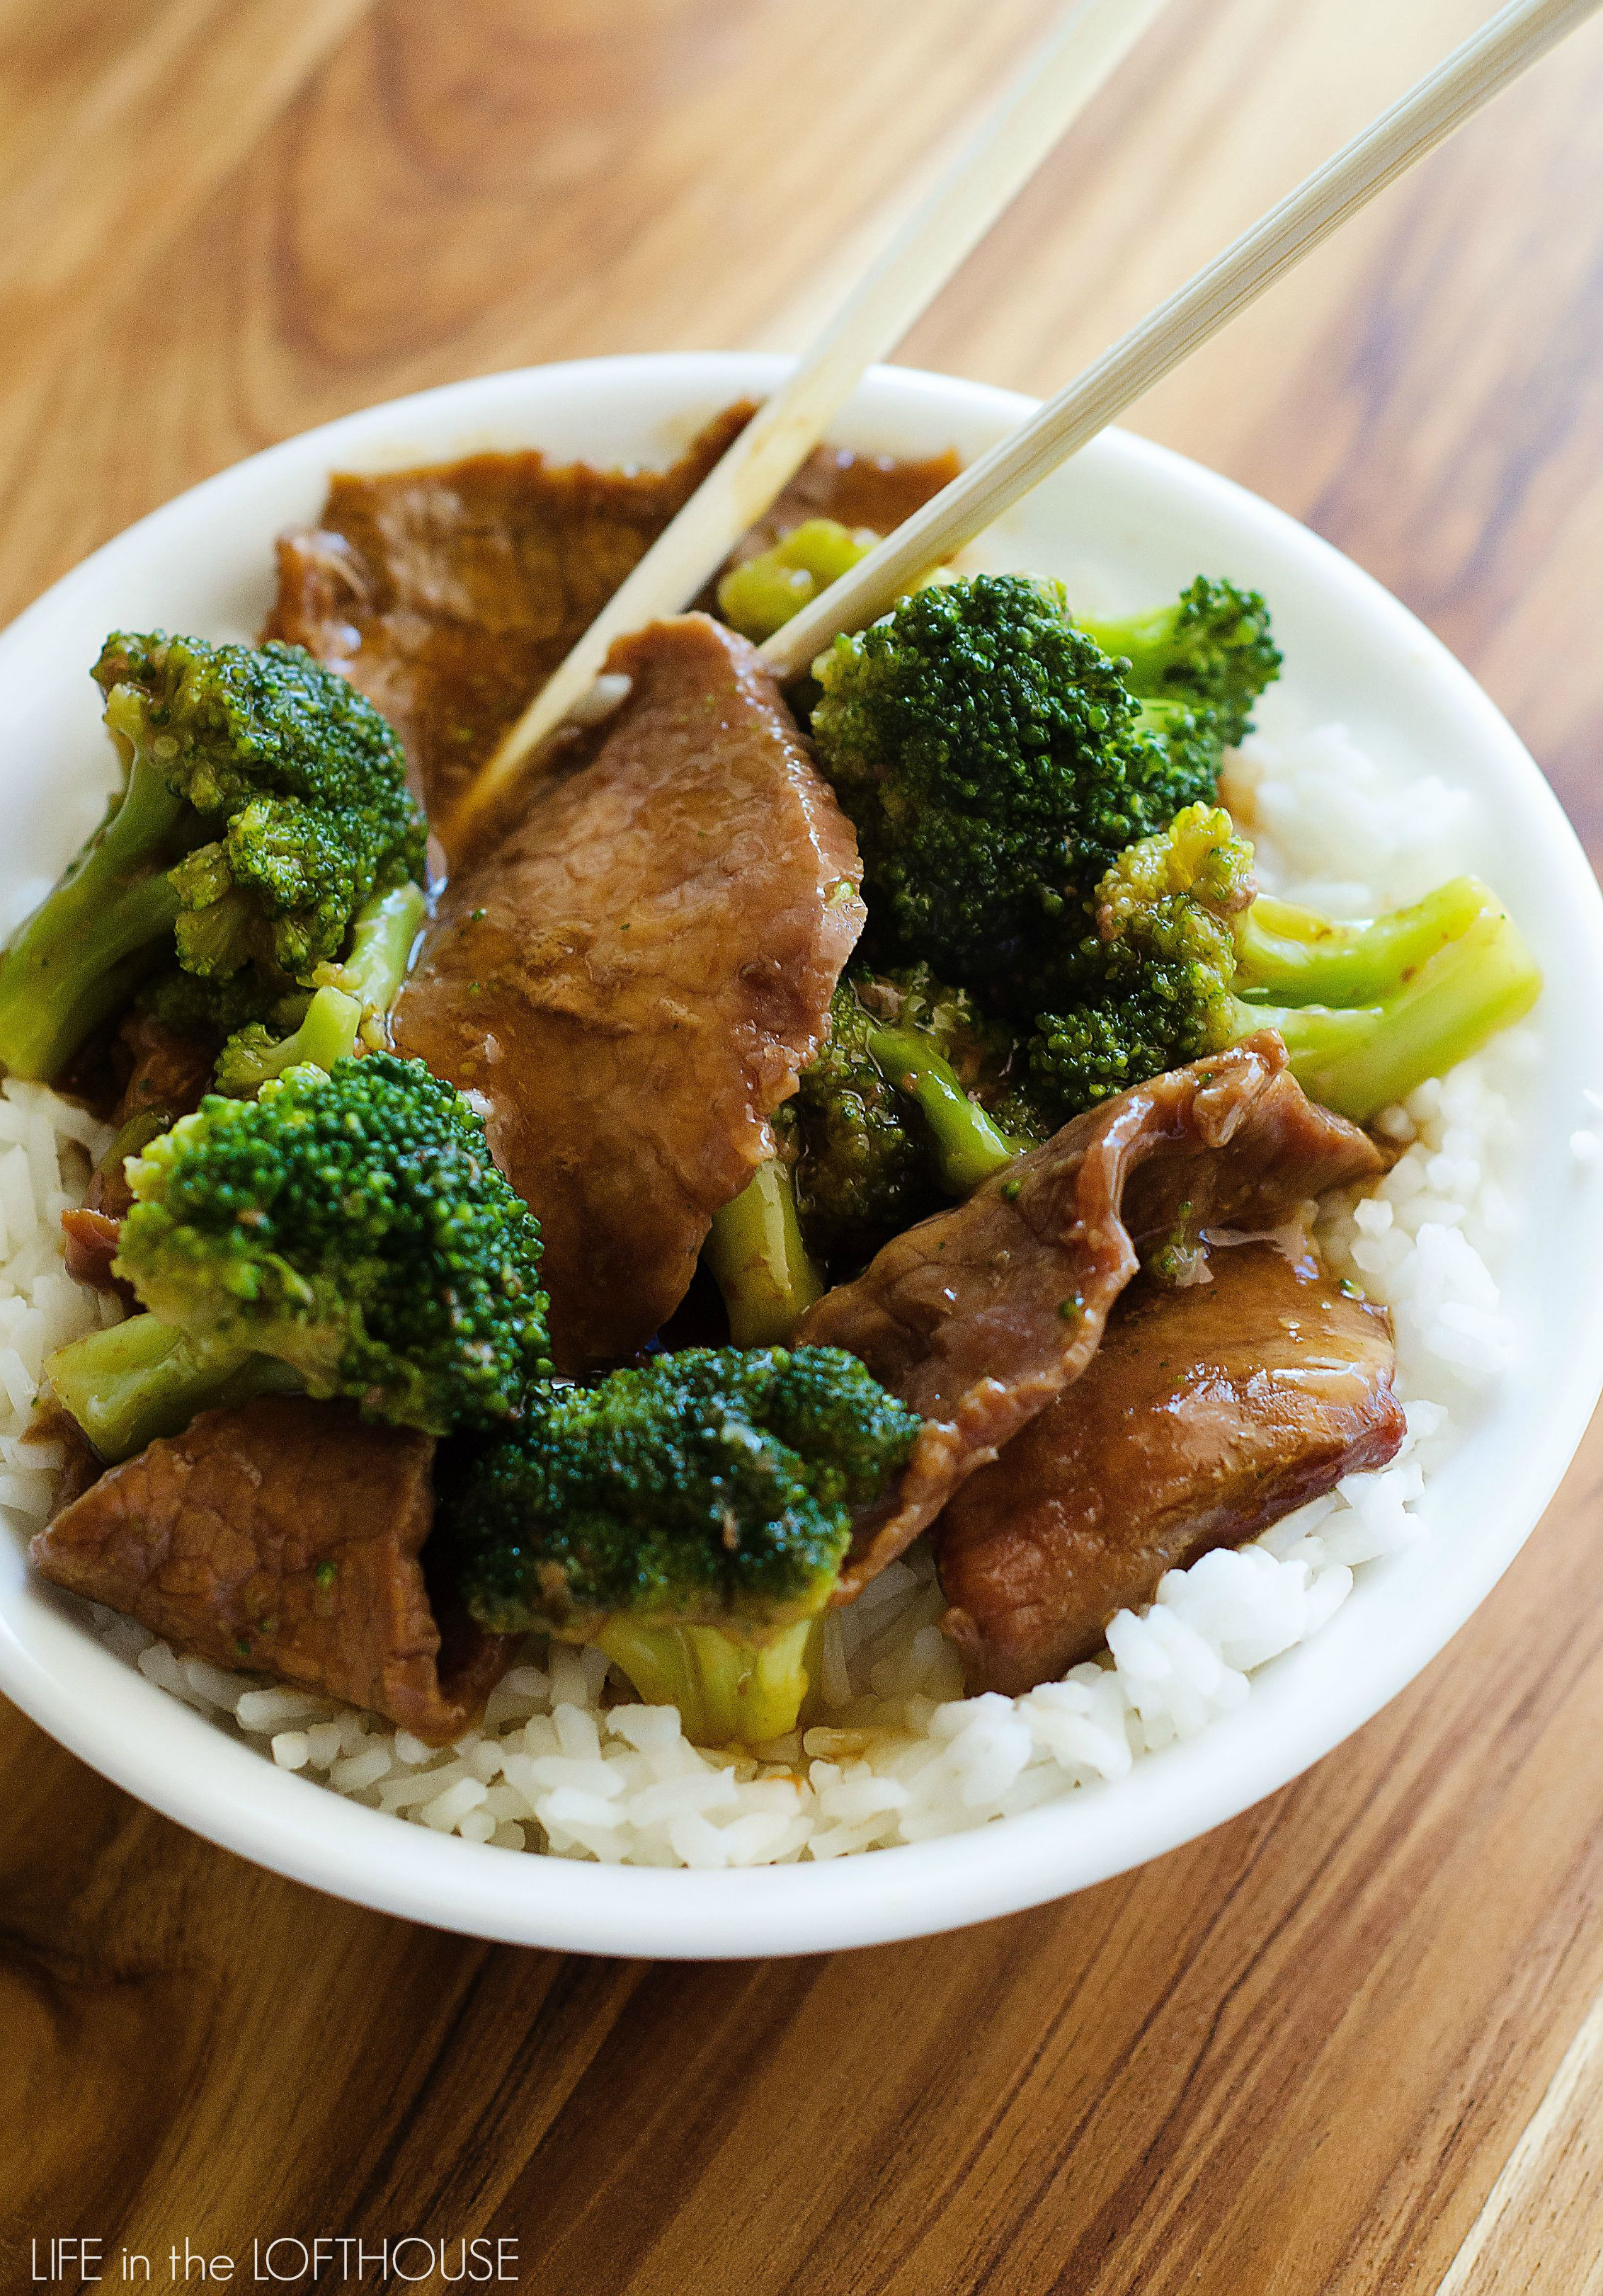 Broccoli And Beef Recipe  Crock Pot Beef and Broccoli